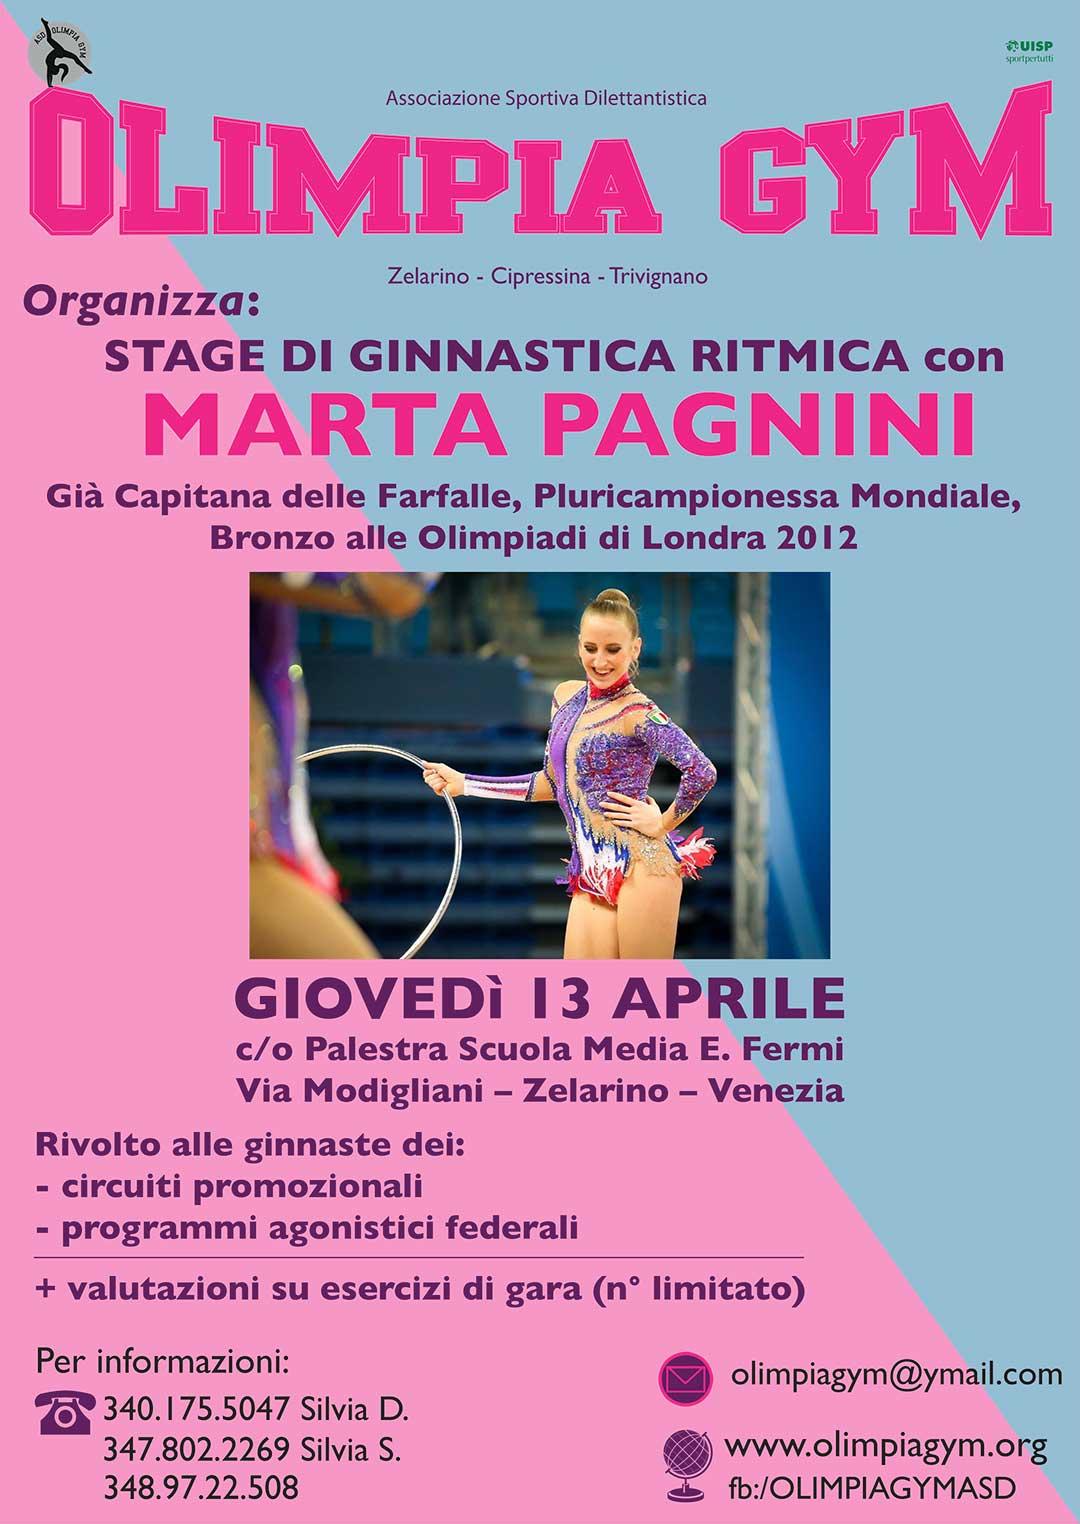 Marta pagnini stage